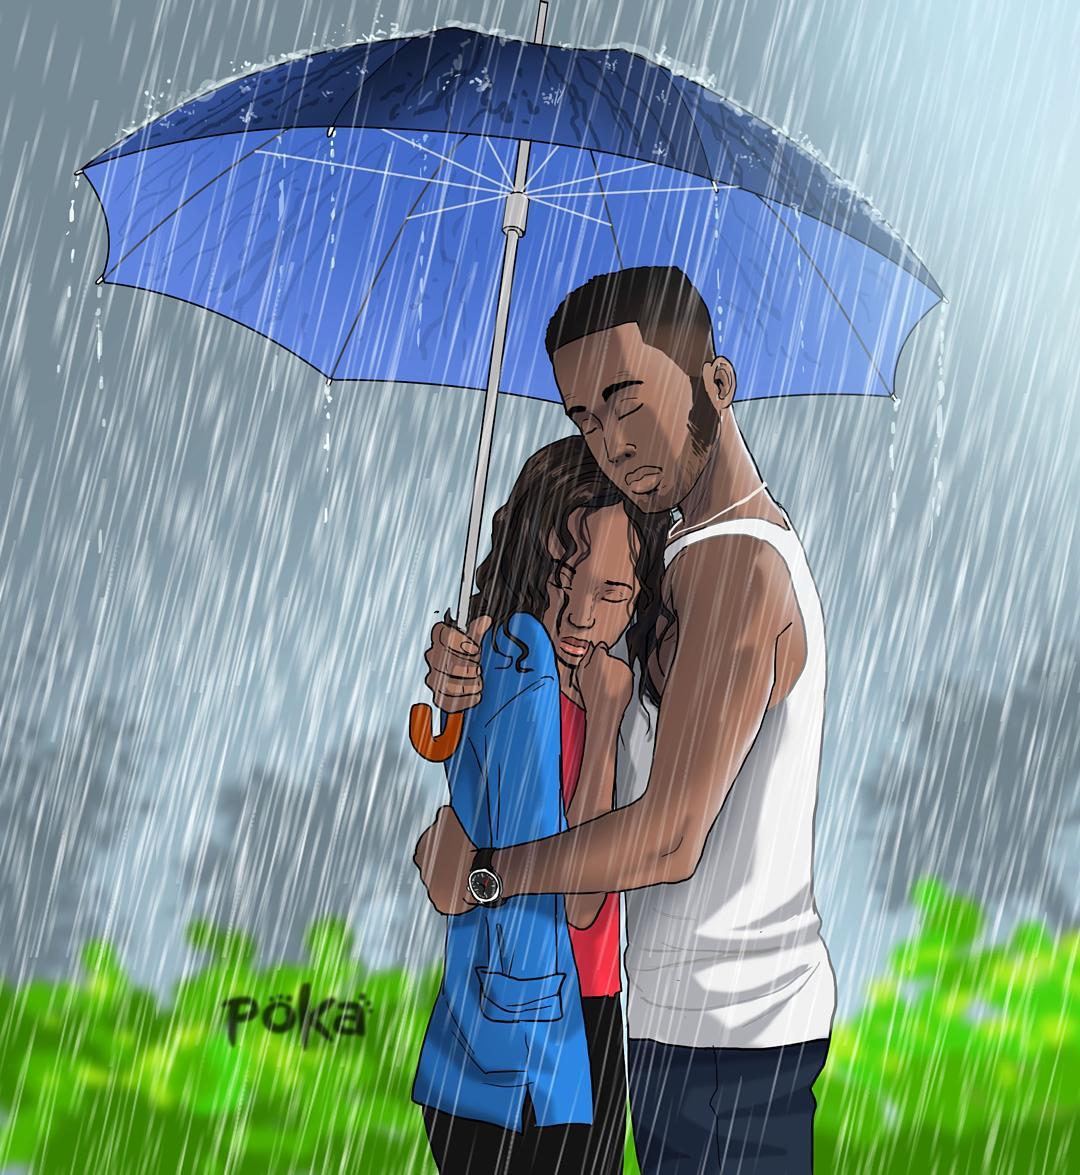 Beautiful Illustration - romance